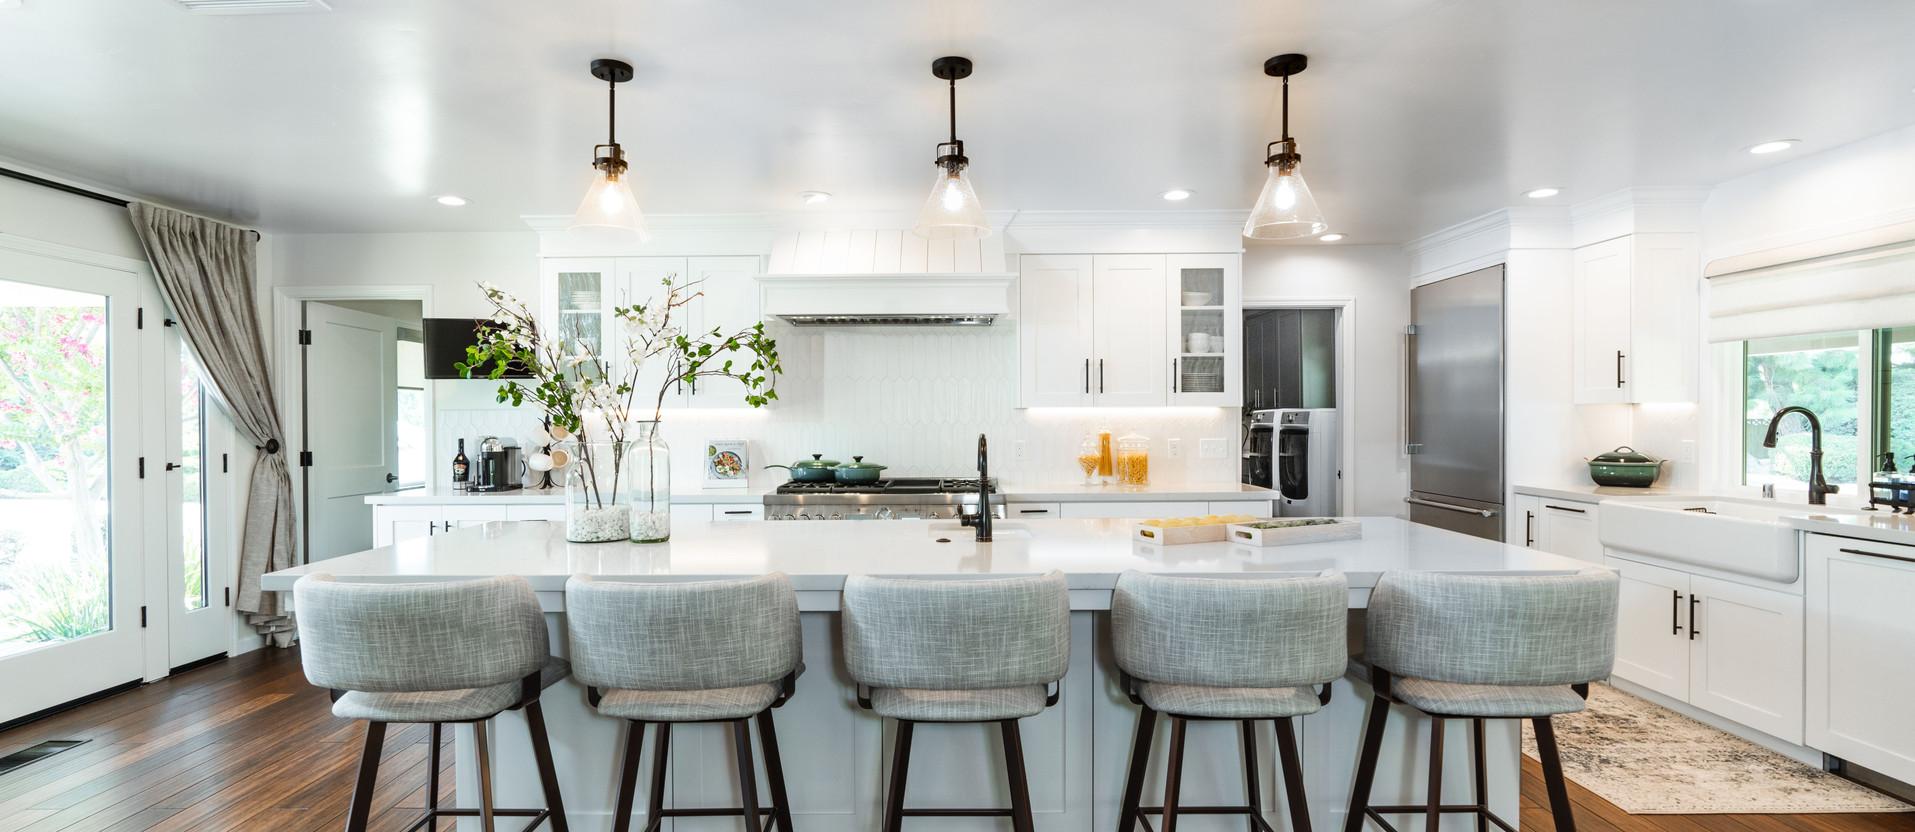 Saturday_9.5.2020_kitchen1.jpeg